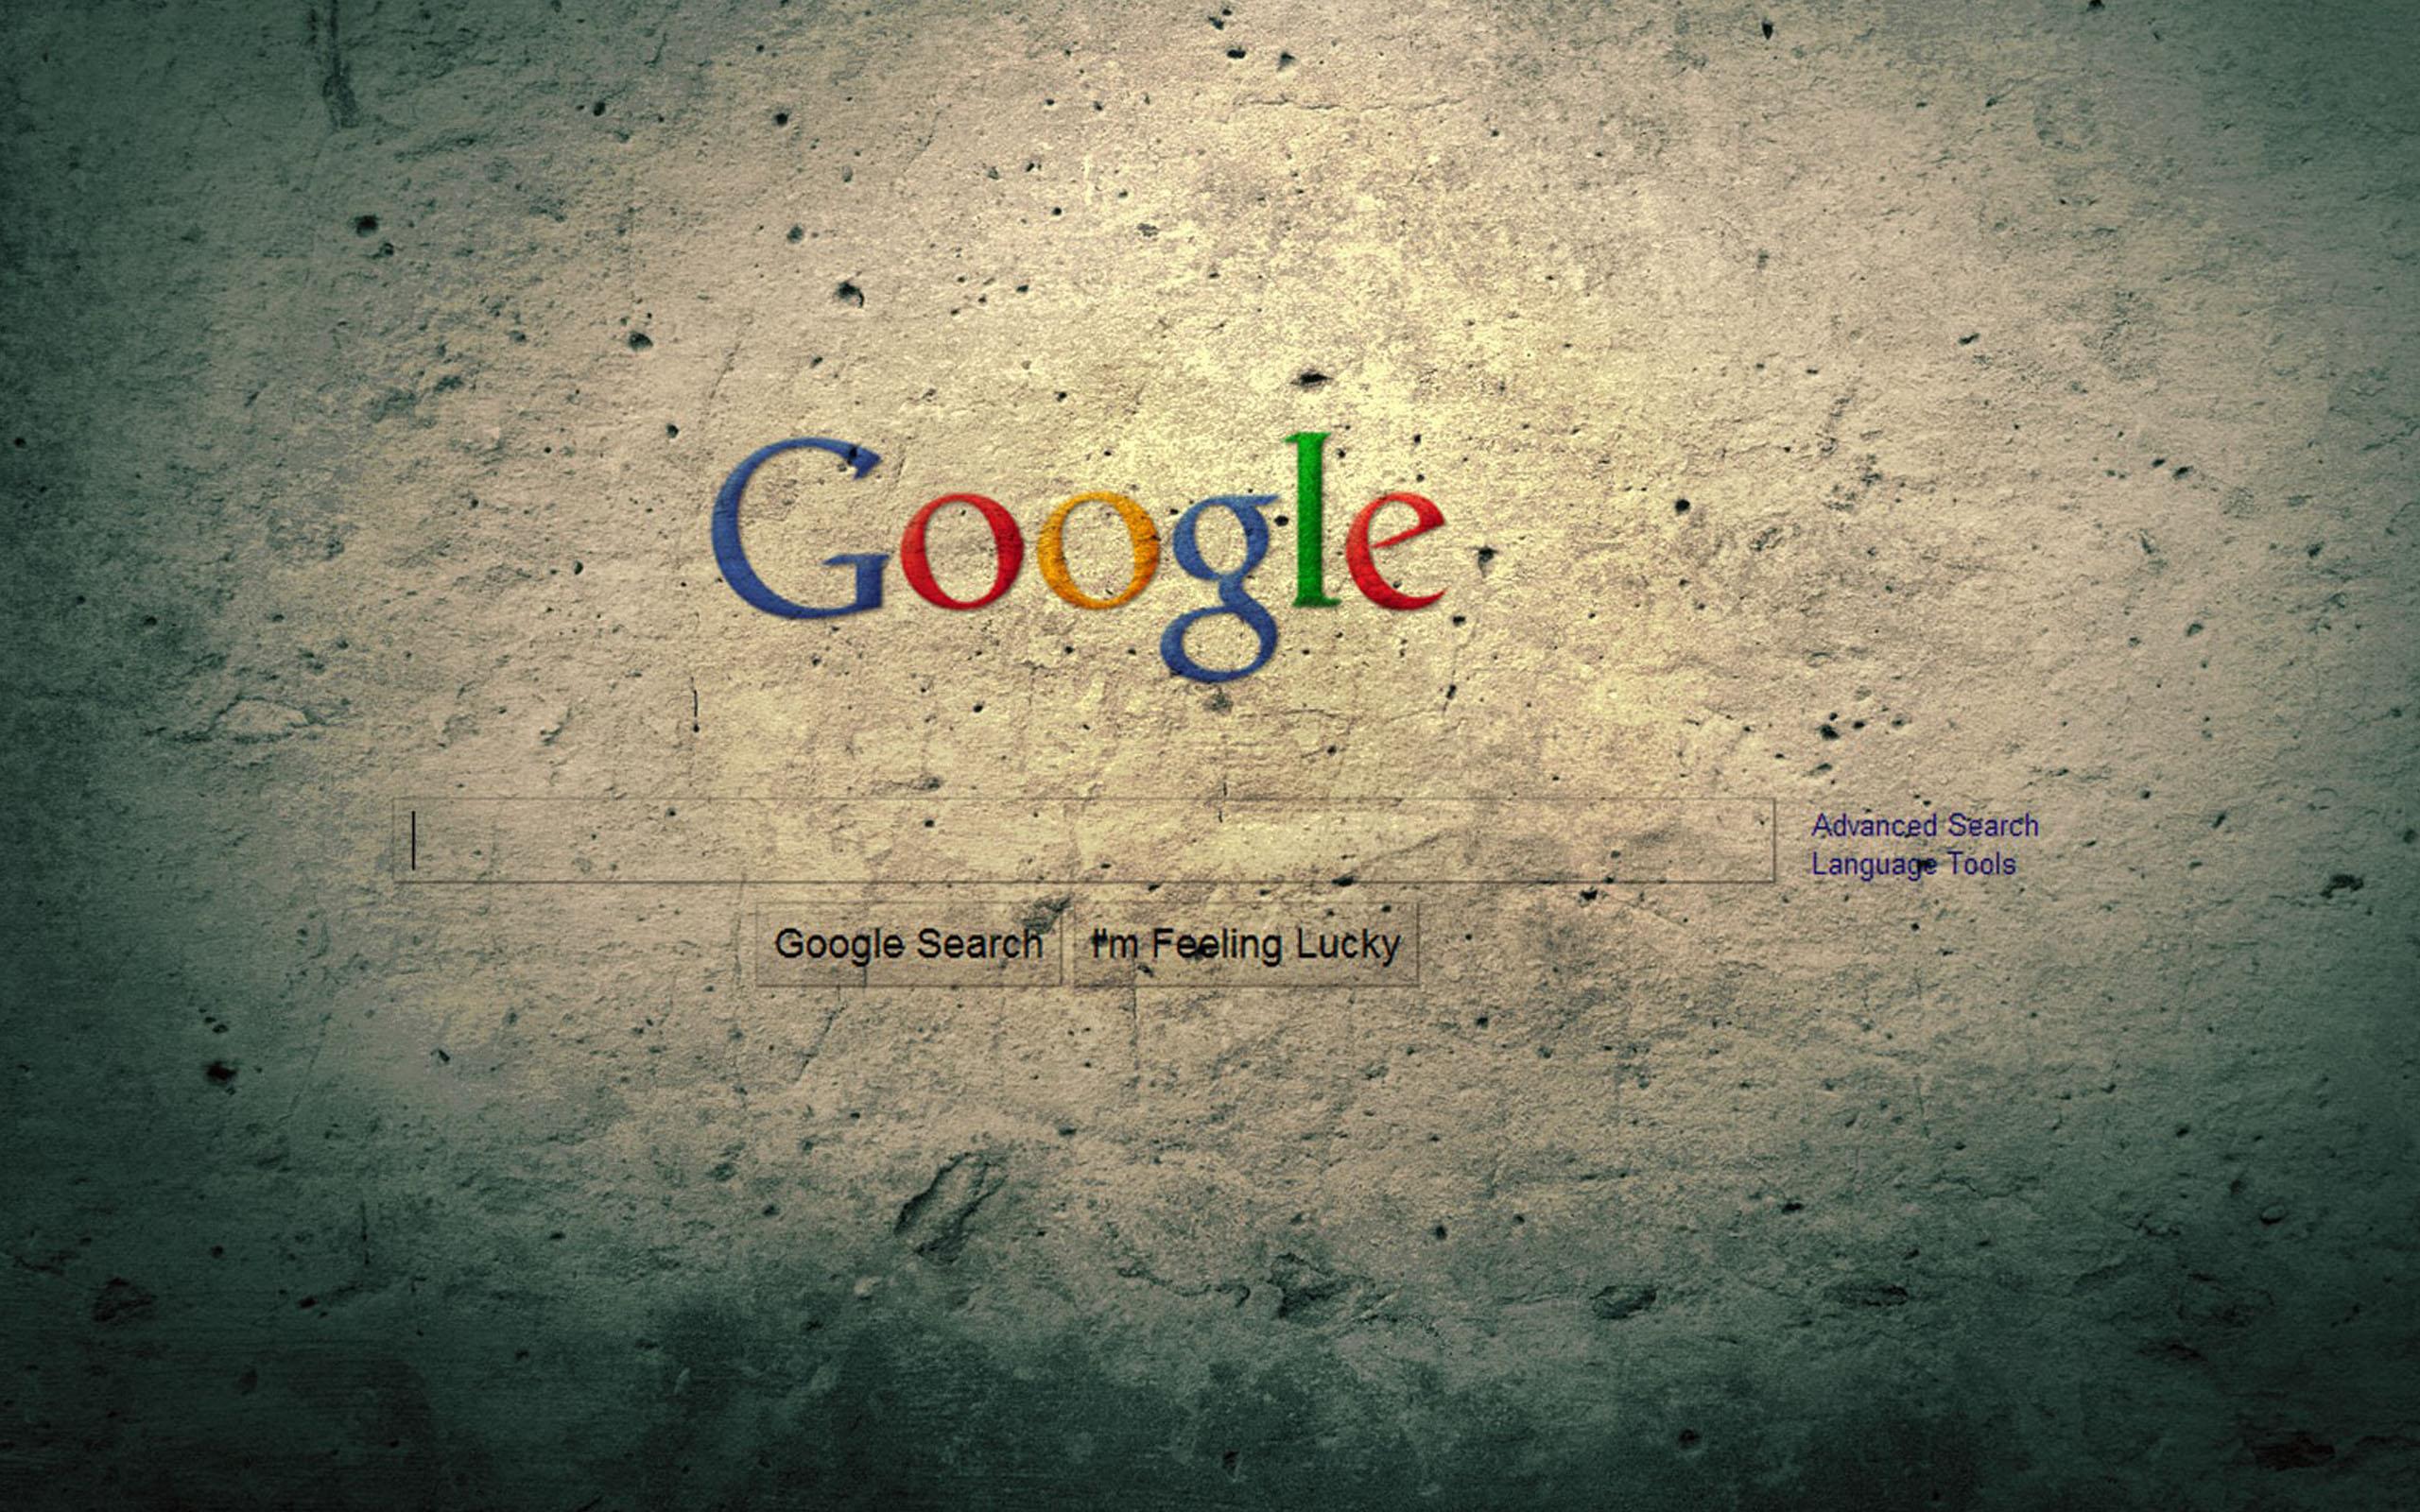 cool google hd image